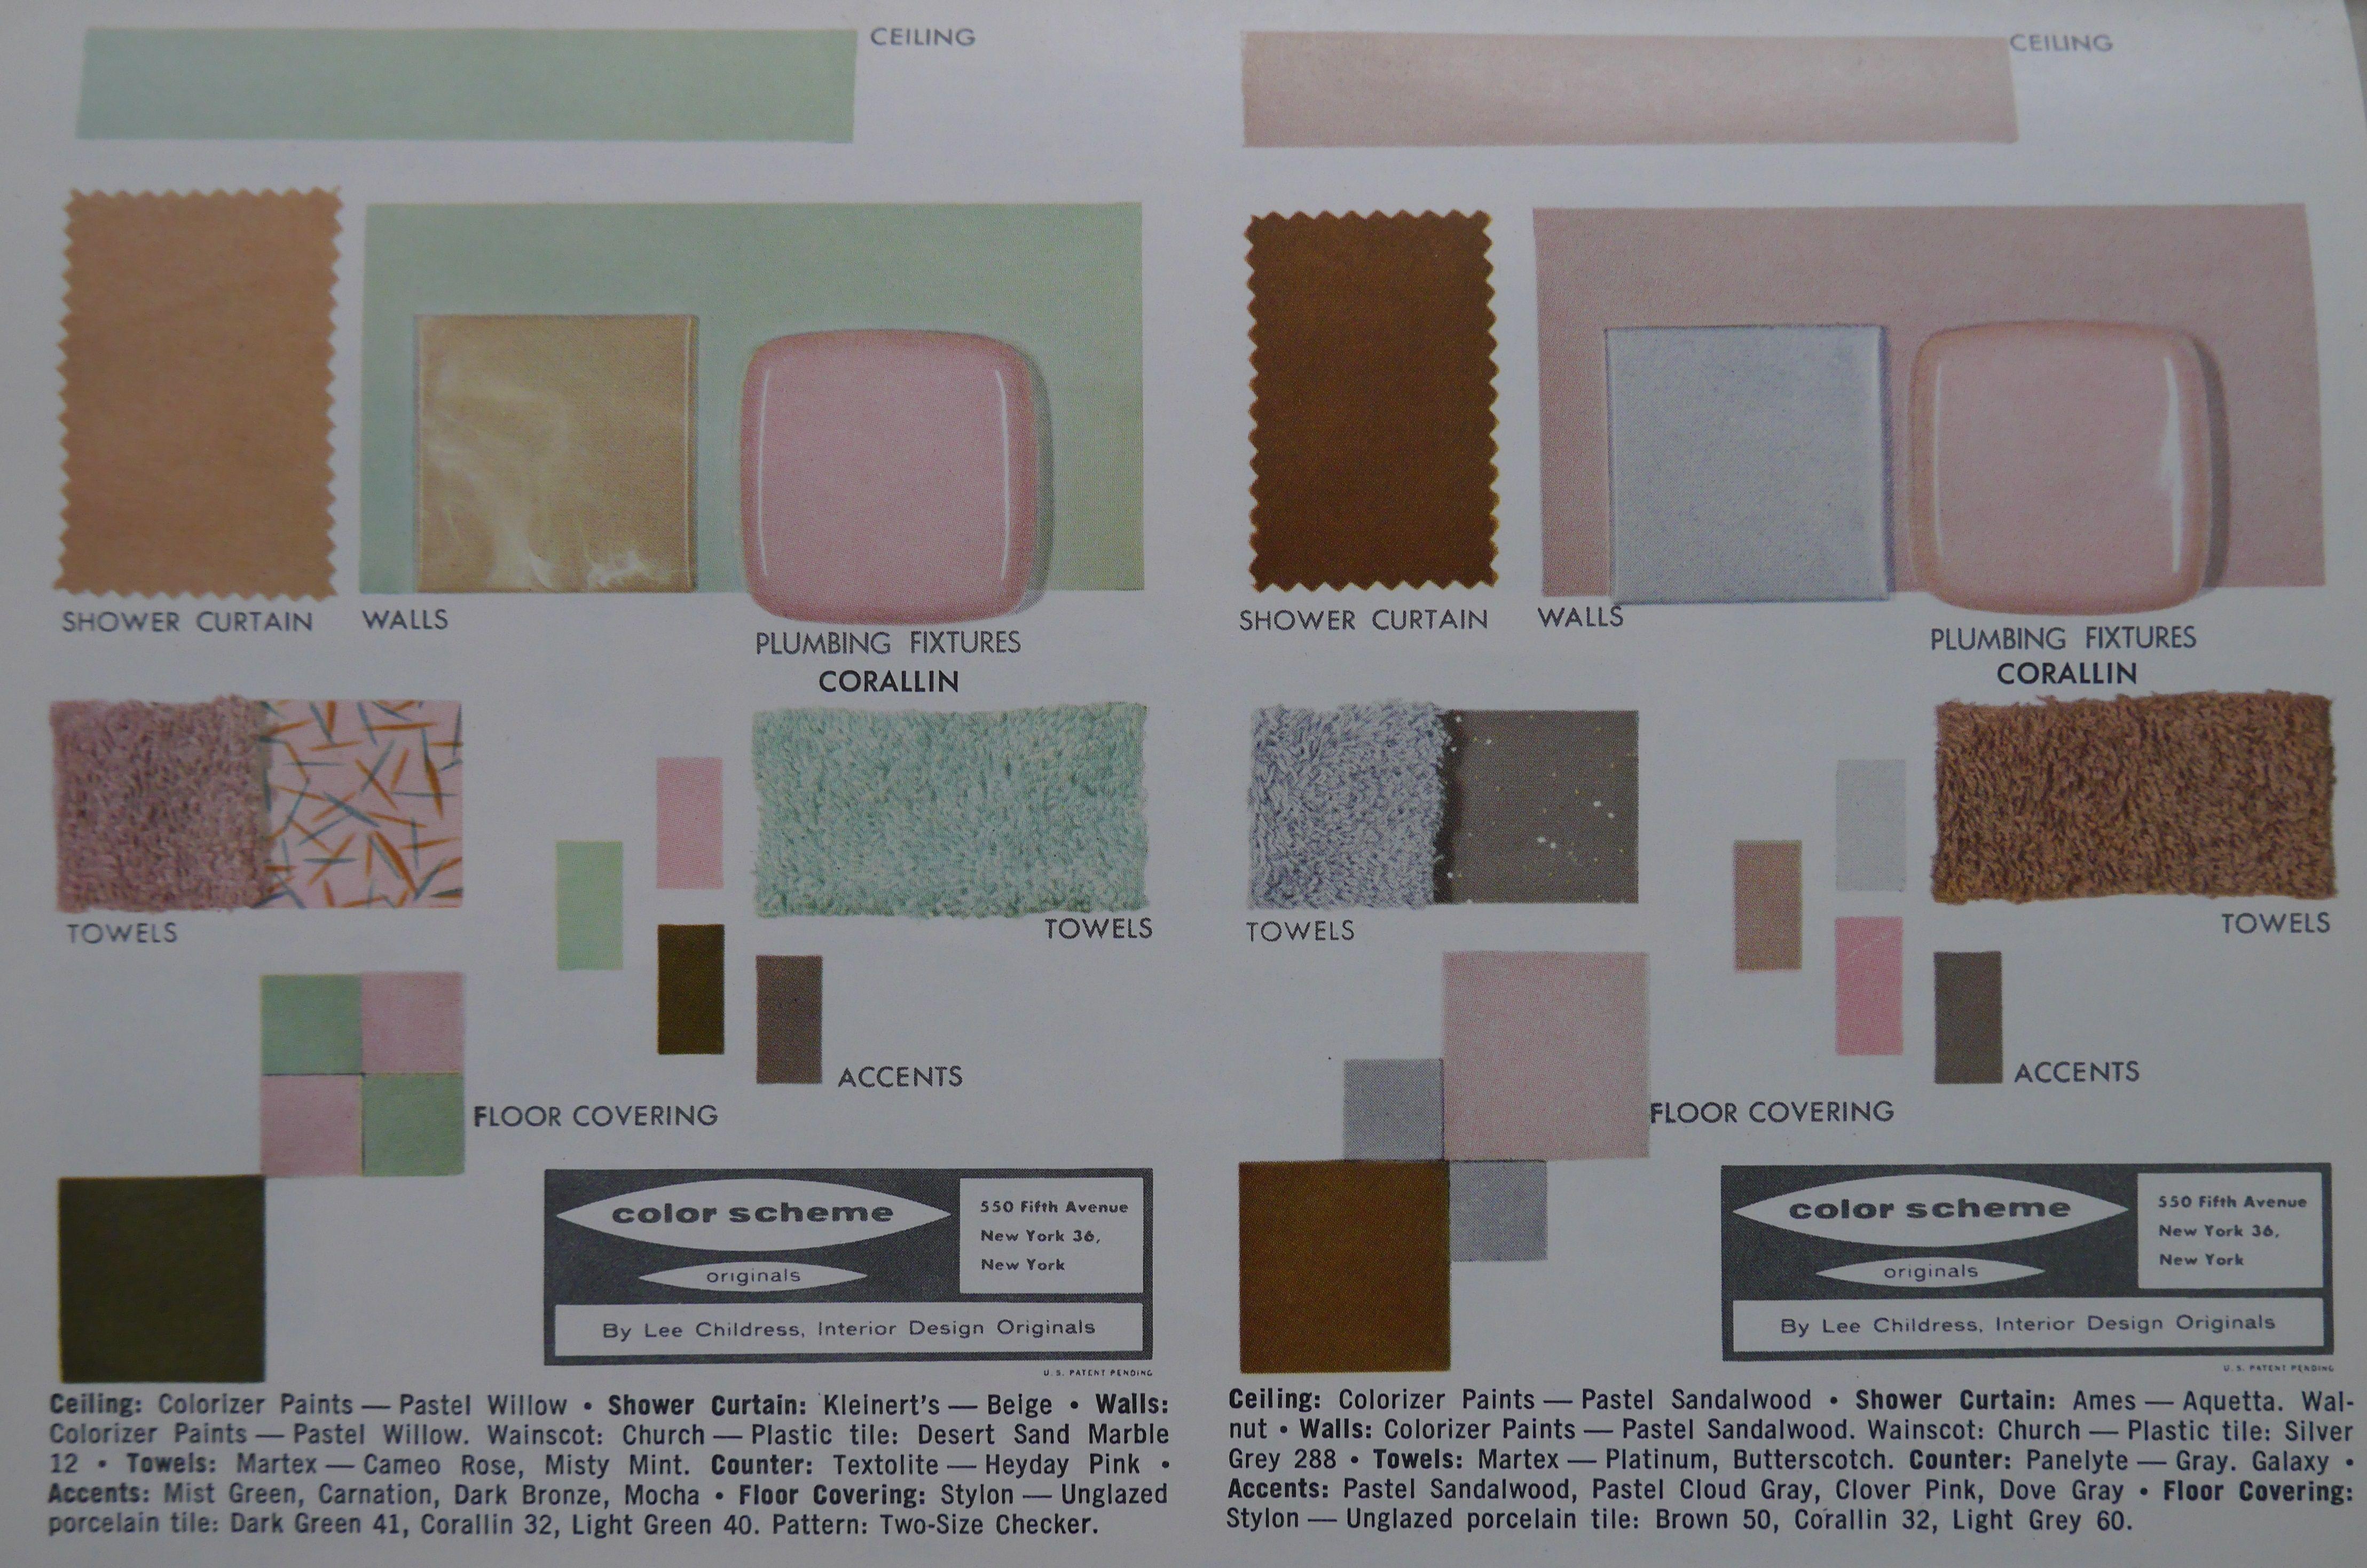 1957 Color Chart Corallin Dream Bathroom Floor Coverings Mid